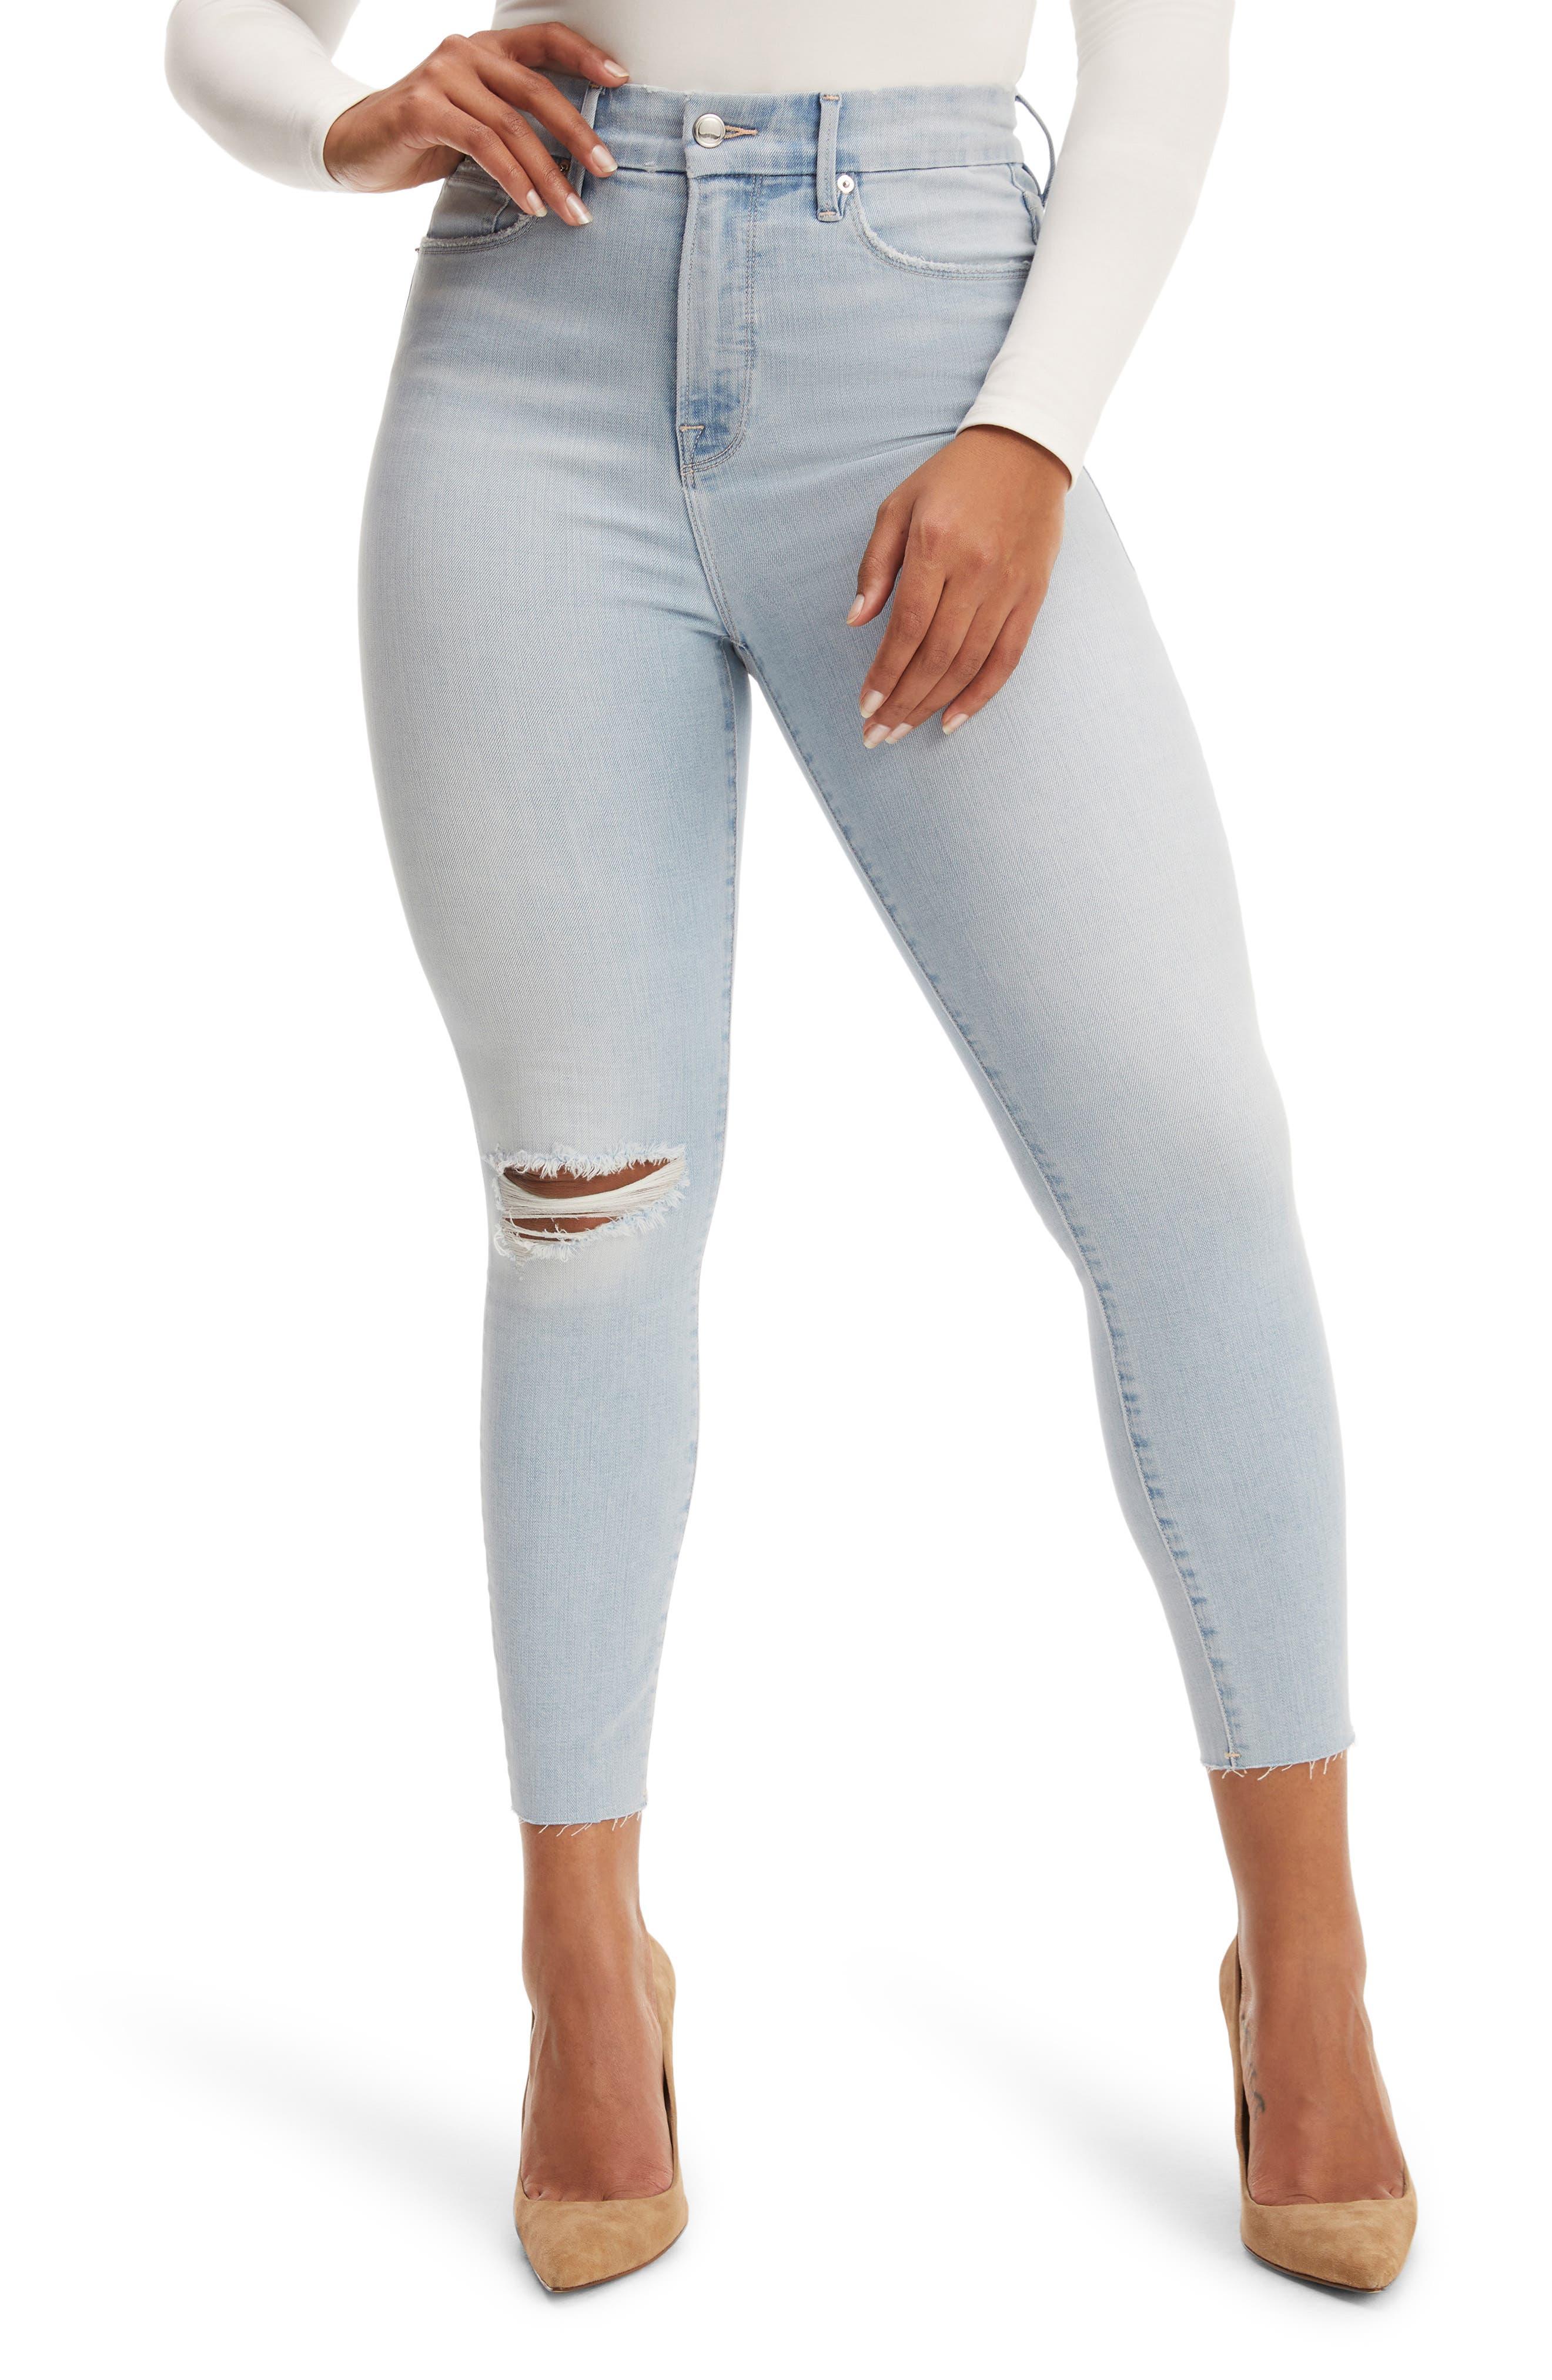 Plus Women's Good American Good Waist Crop Raw Edge Skinny Jeans